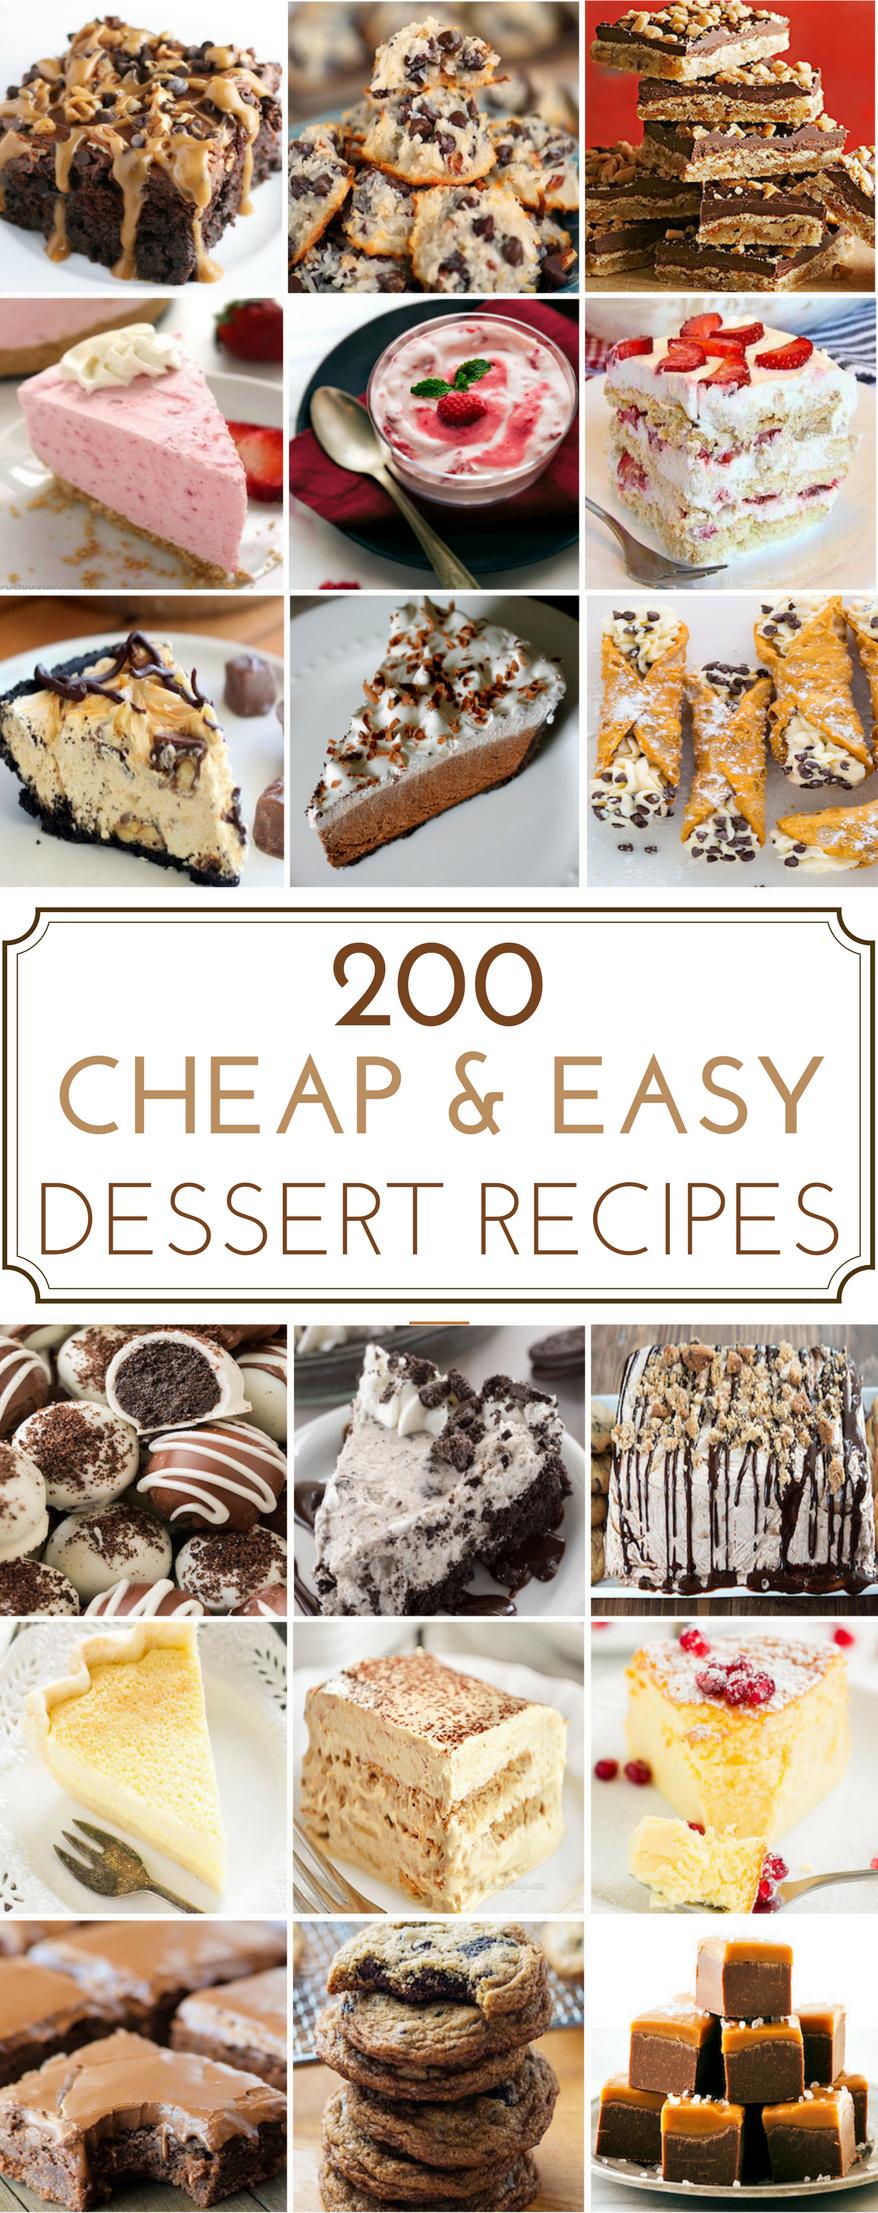 200 Cheap Easy Desserts Quick Easy Desserts Easy Desserts Dessert Recipes Easy